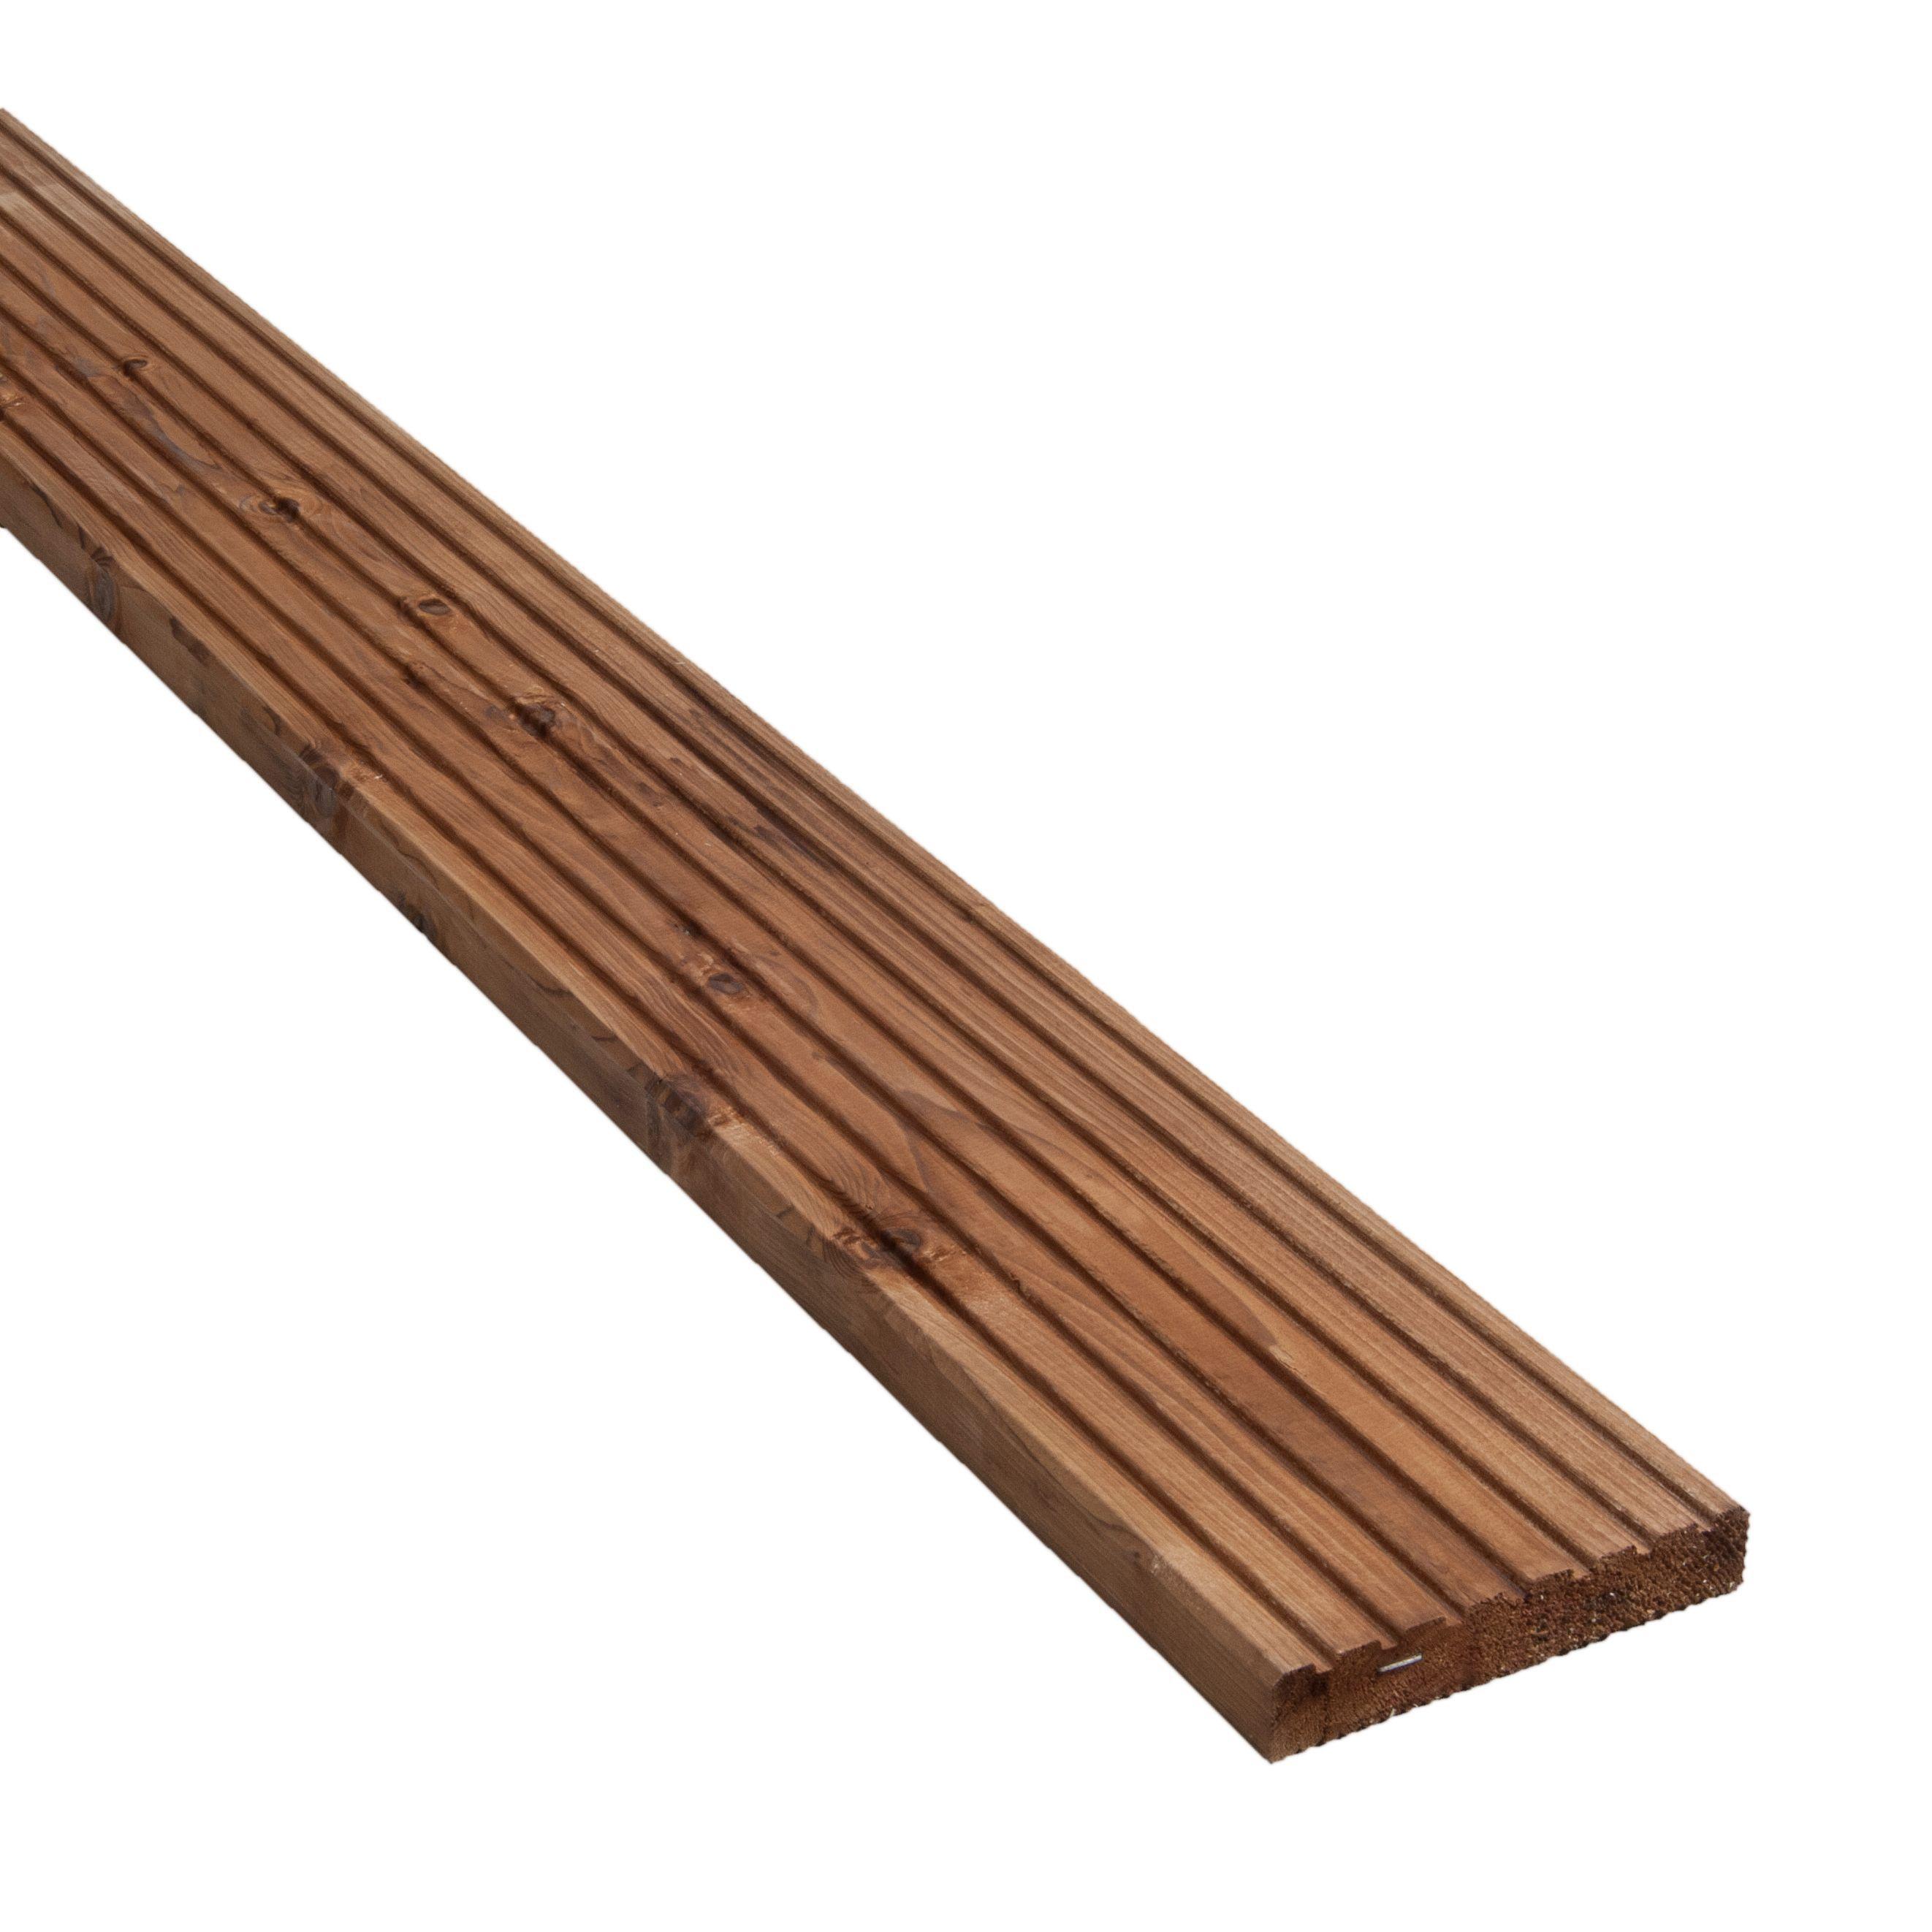 Blooma Nevou Premium Brown Spruce Deck Board (t)27mm (w)144mm (l)4800mm